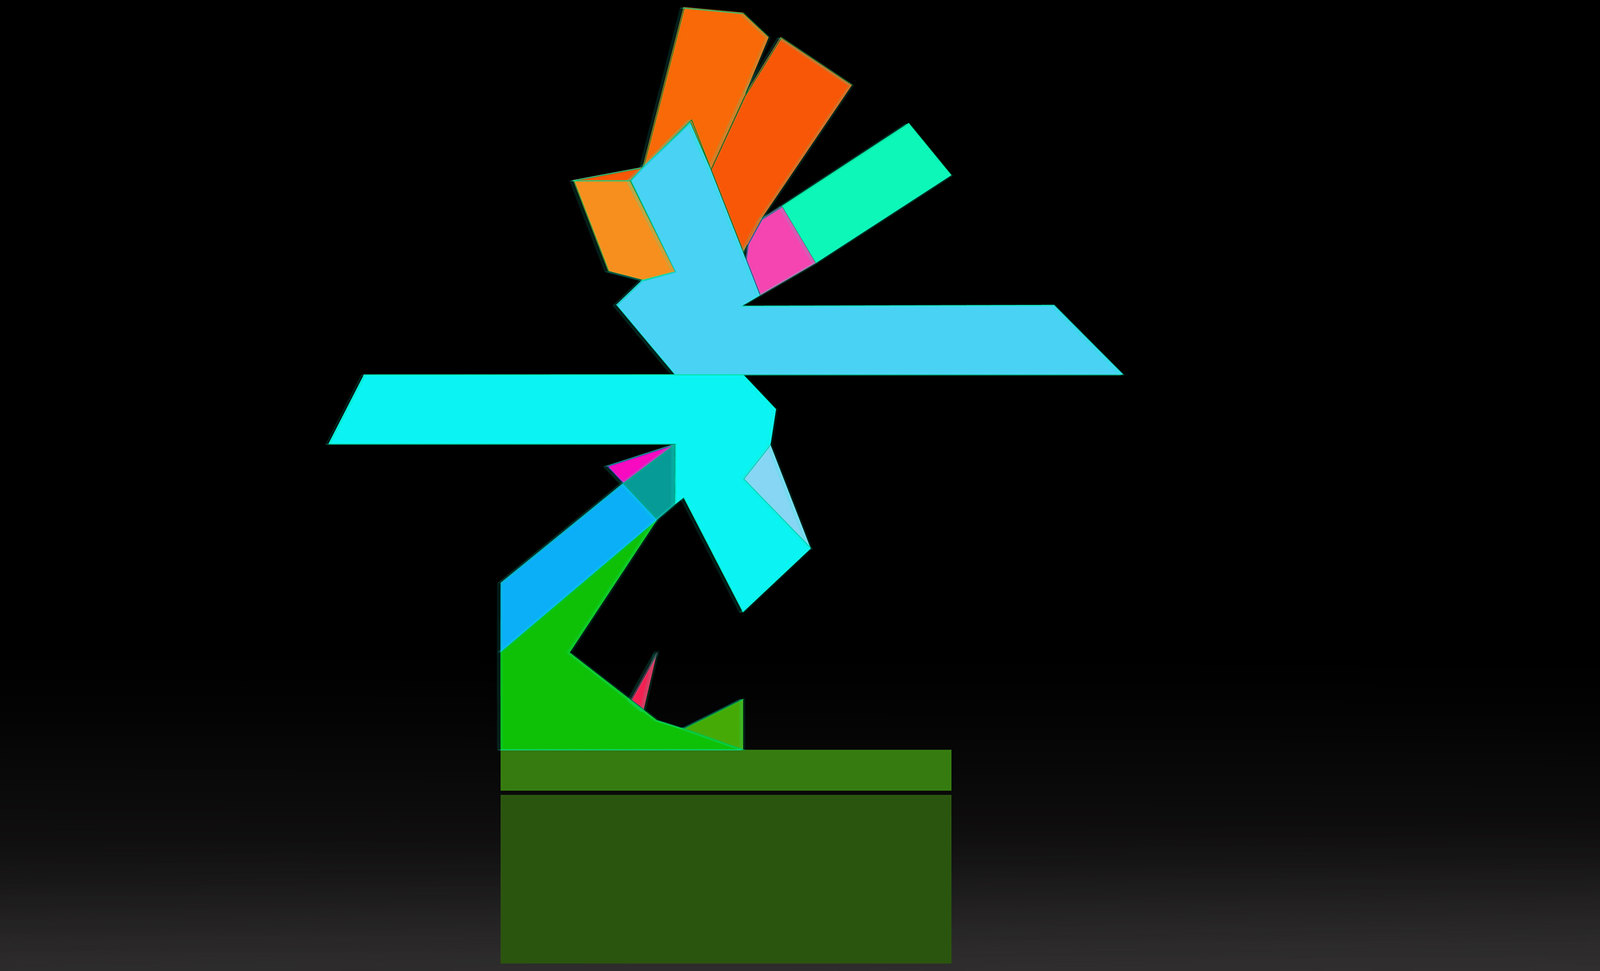 Escultura MAM mx 022